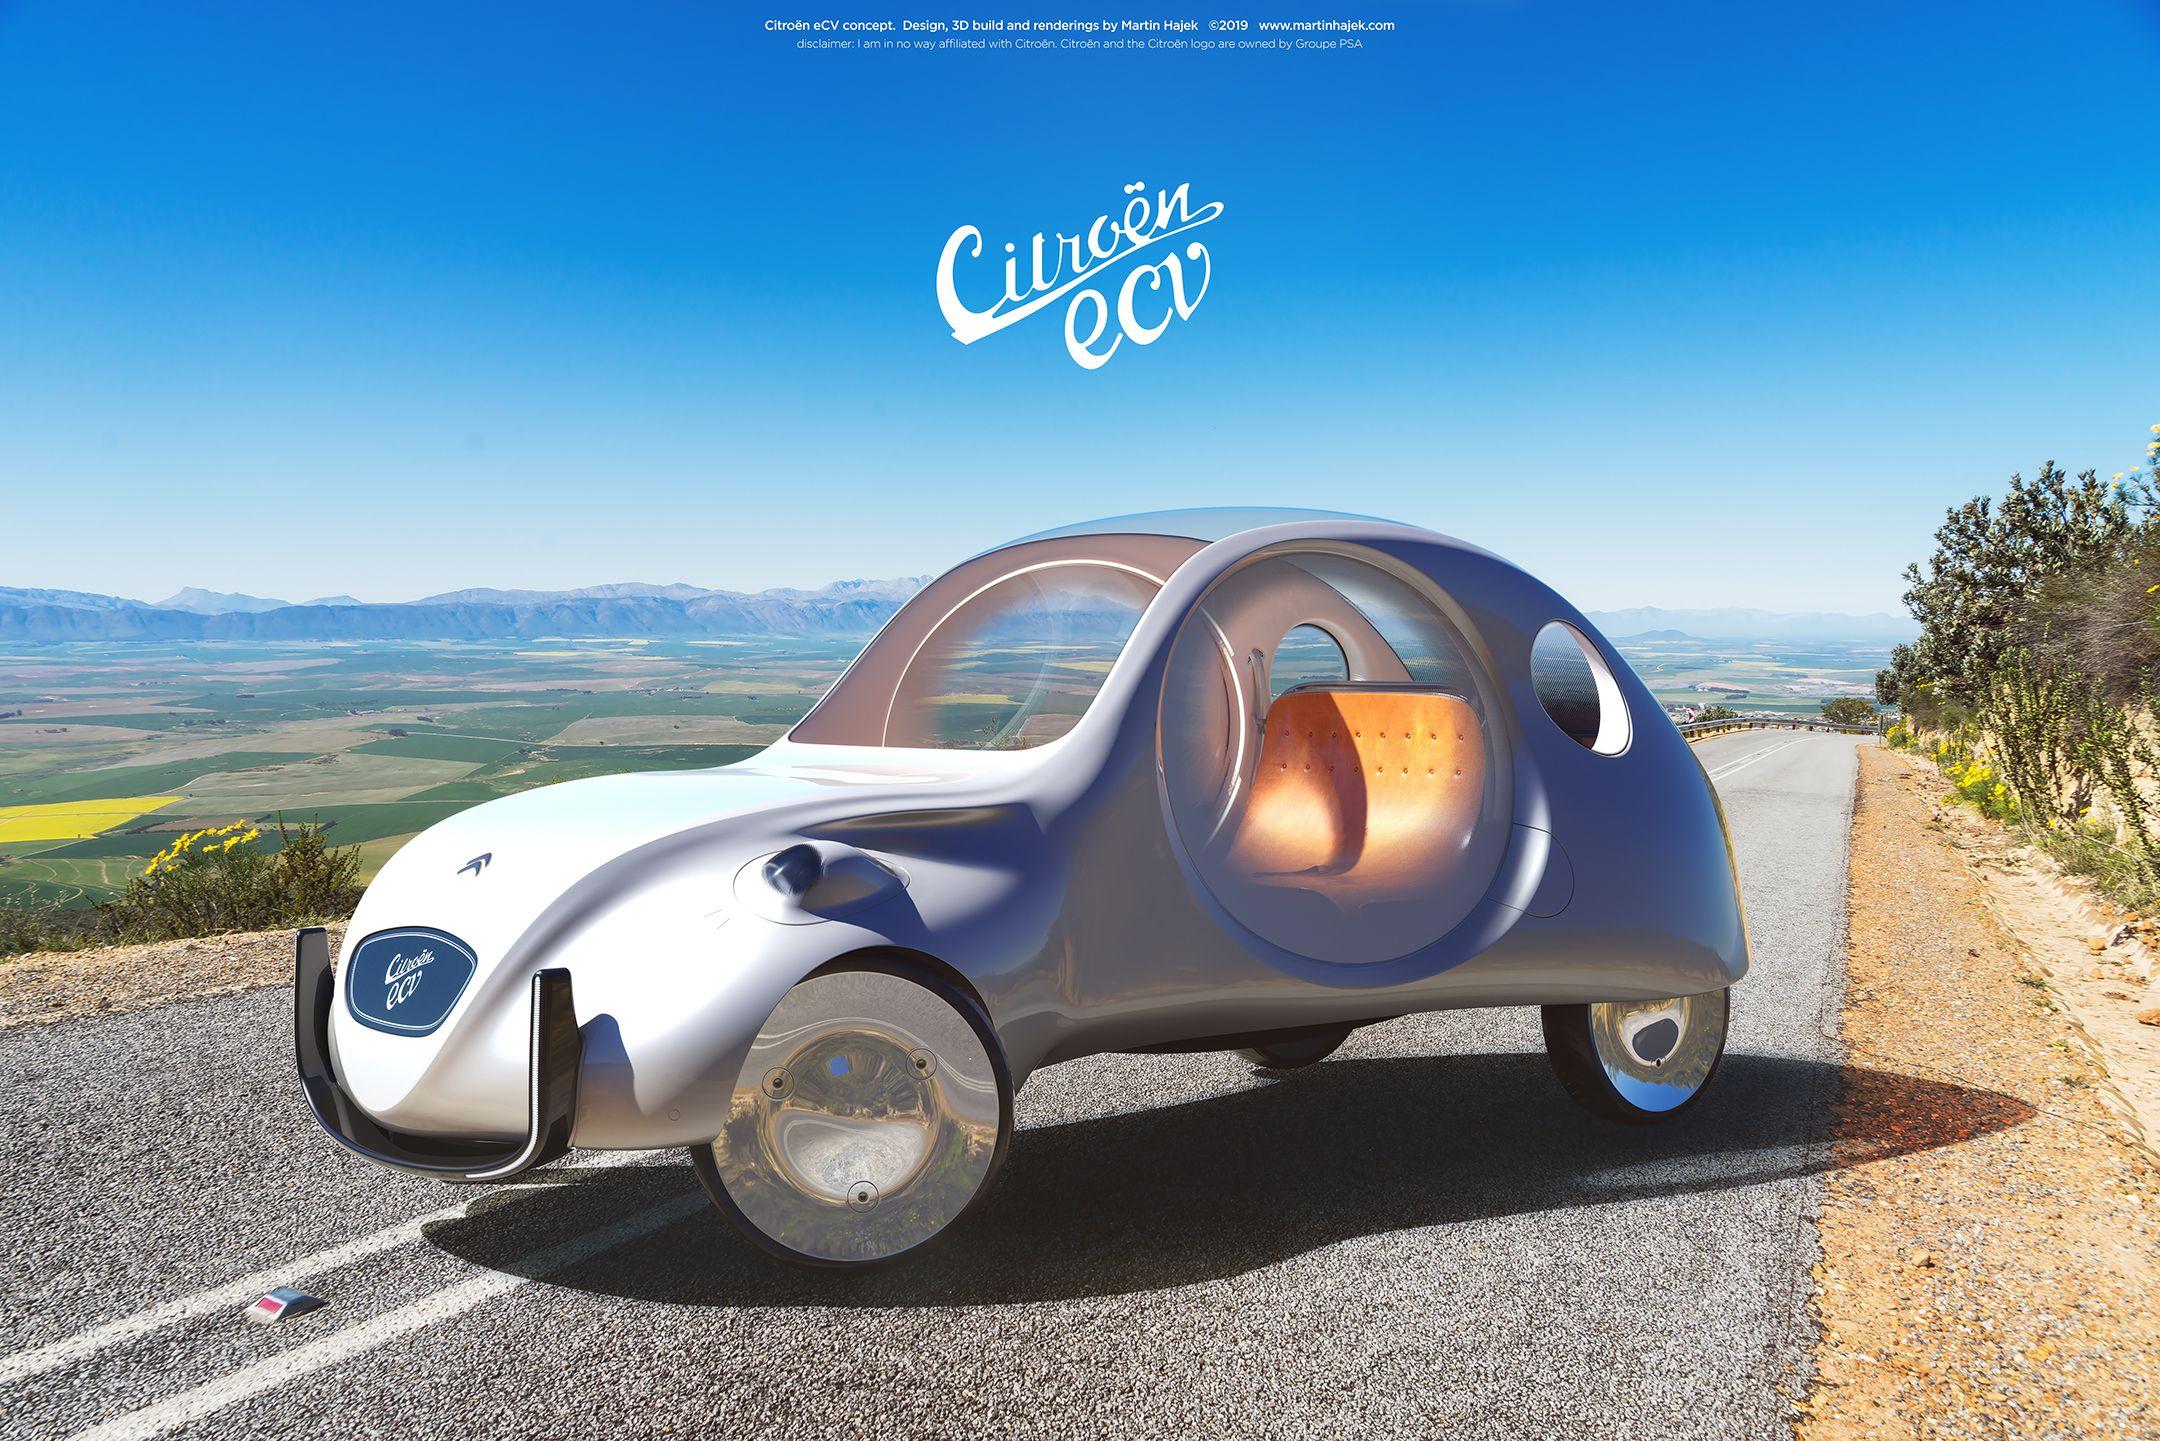 Citroen Ecv Concept Car Design On Behance Concept Car Design Concept Cars Citroen Concept